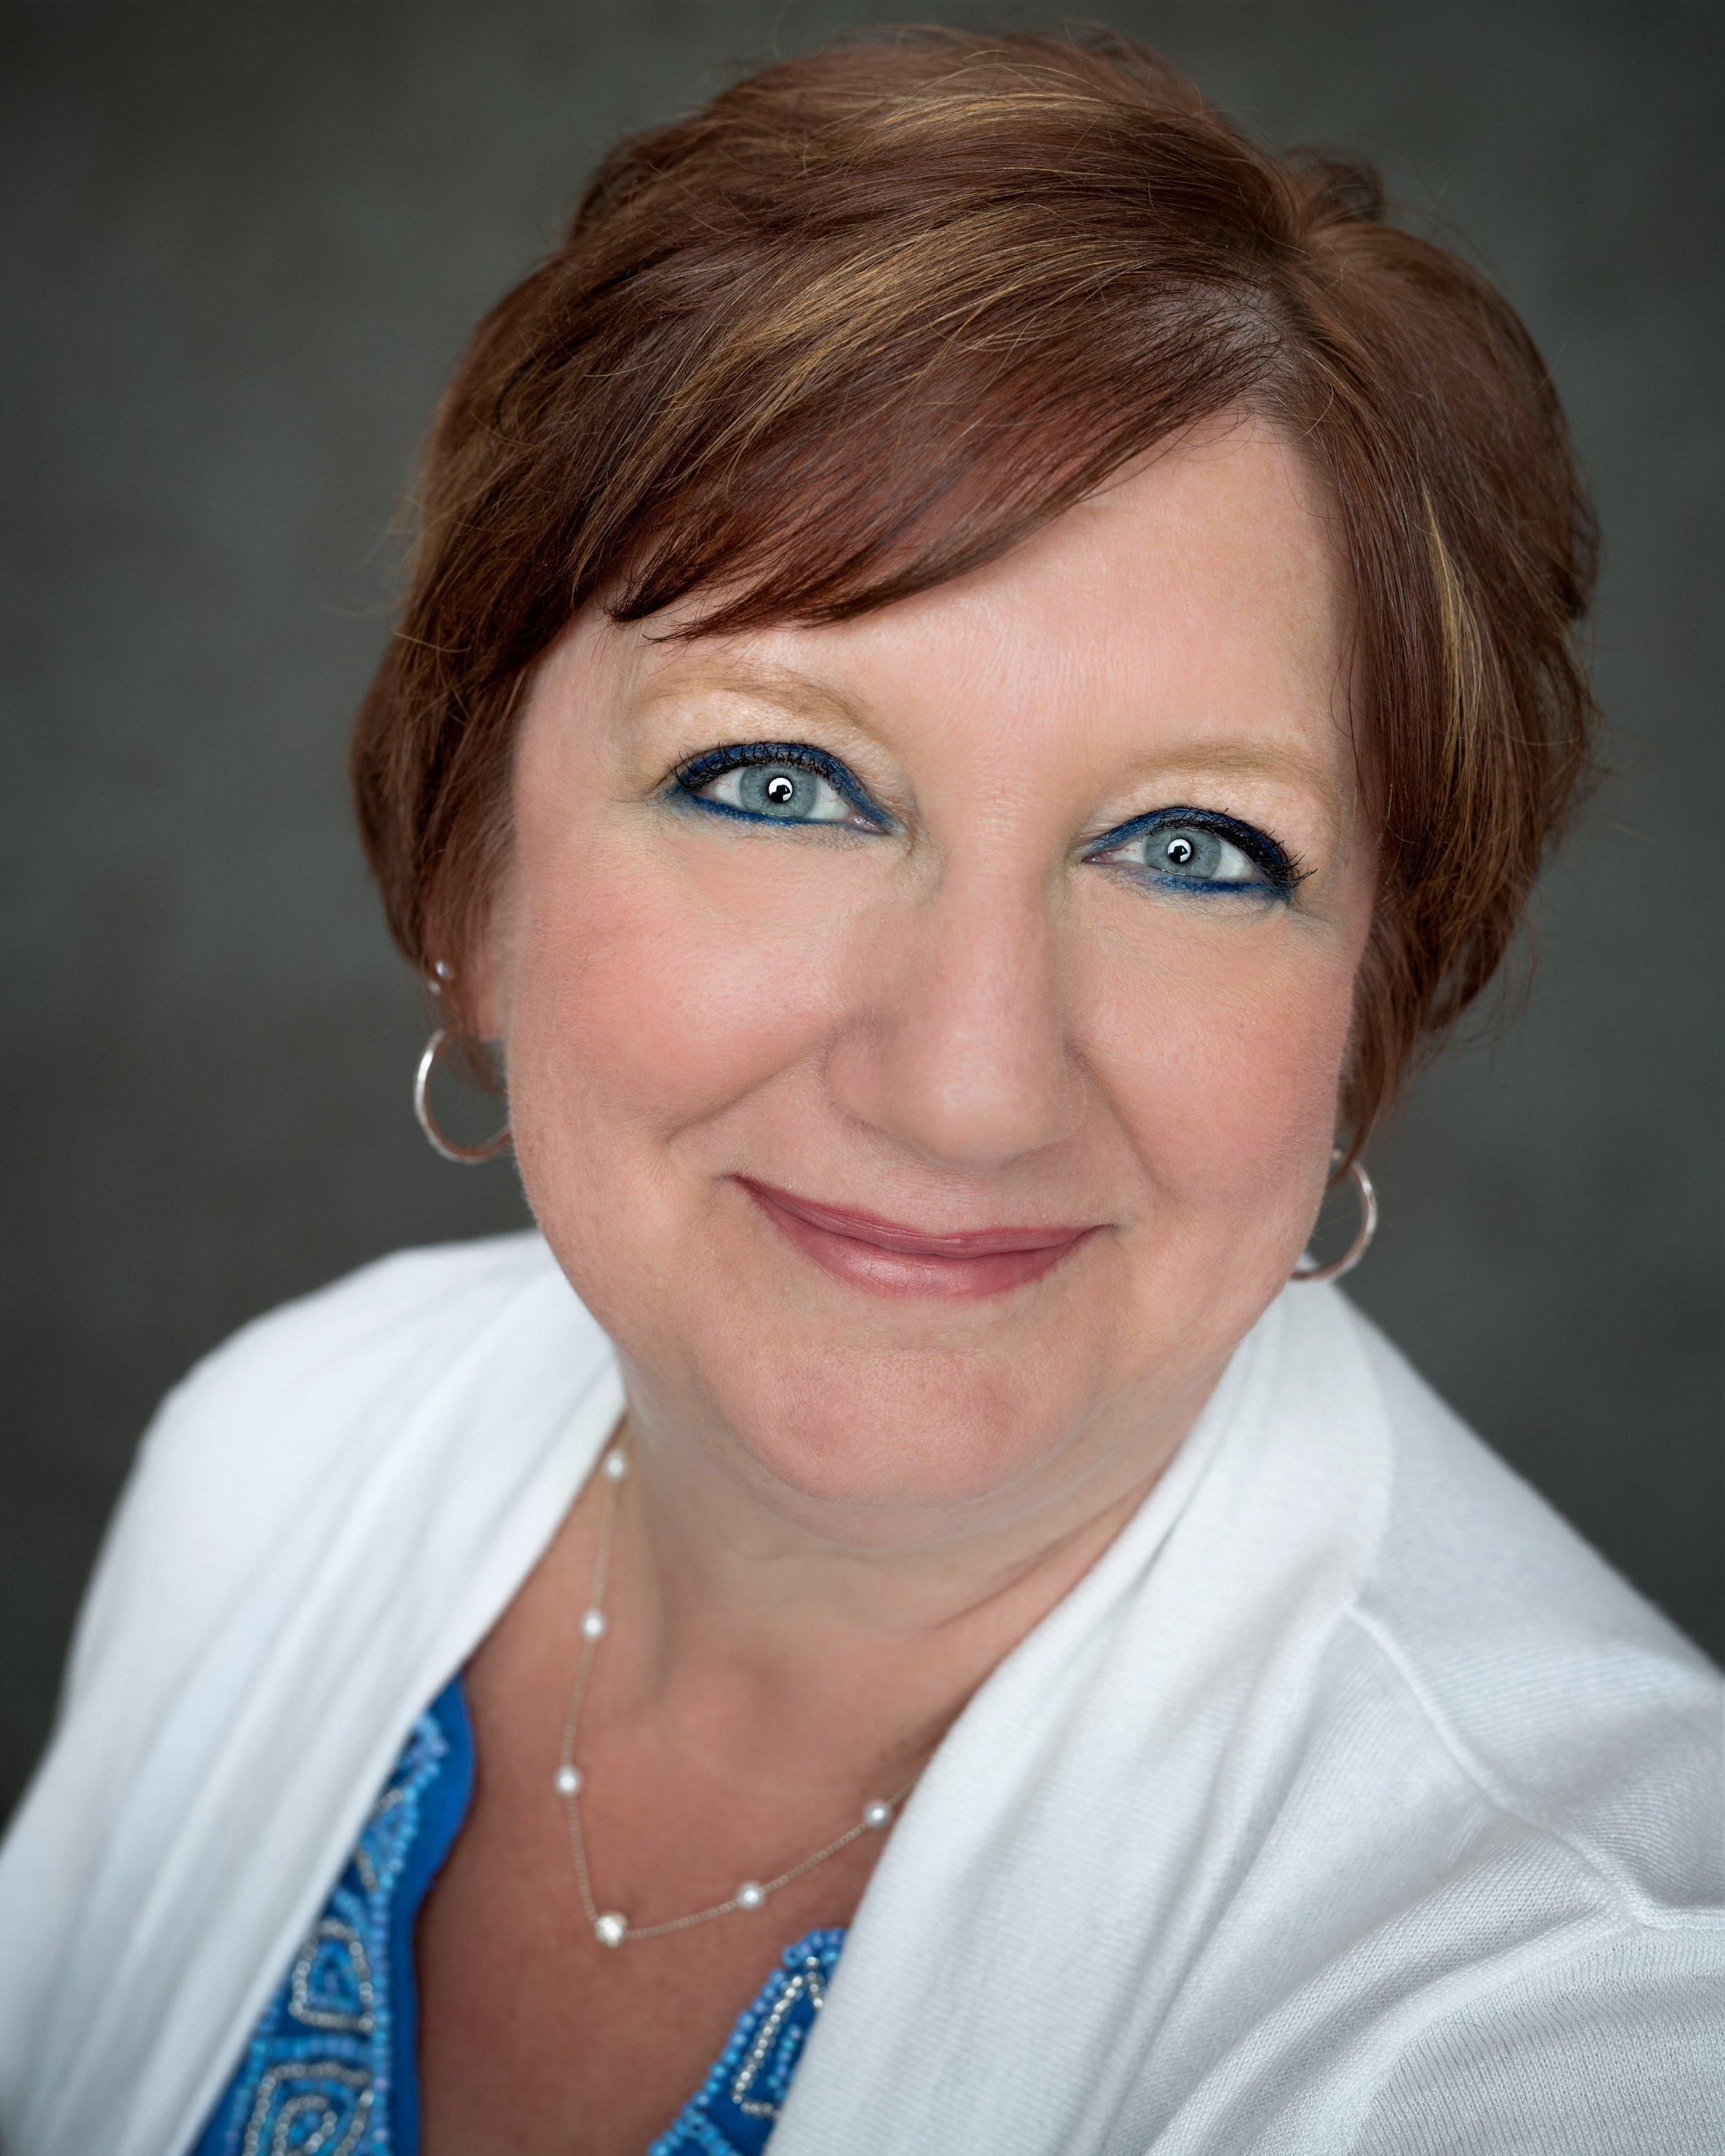 Stacy Eaton, Director